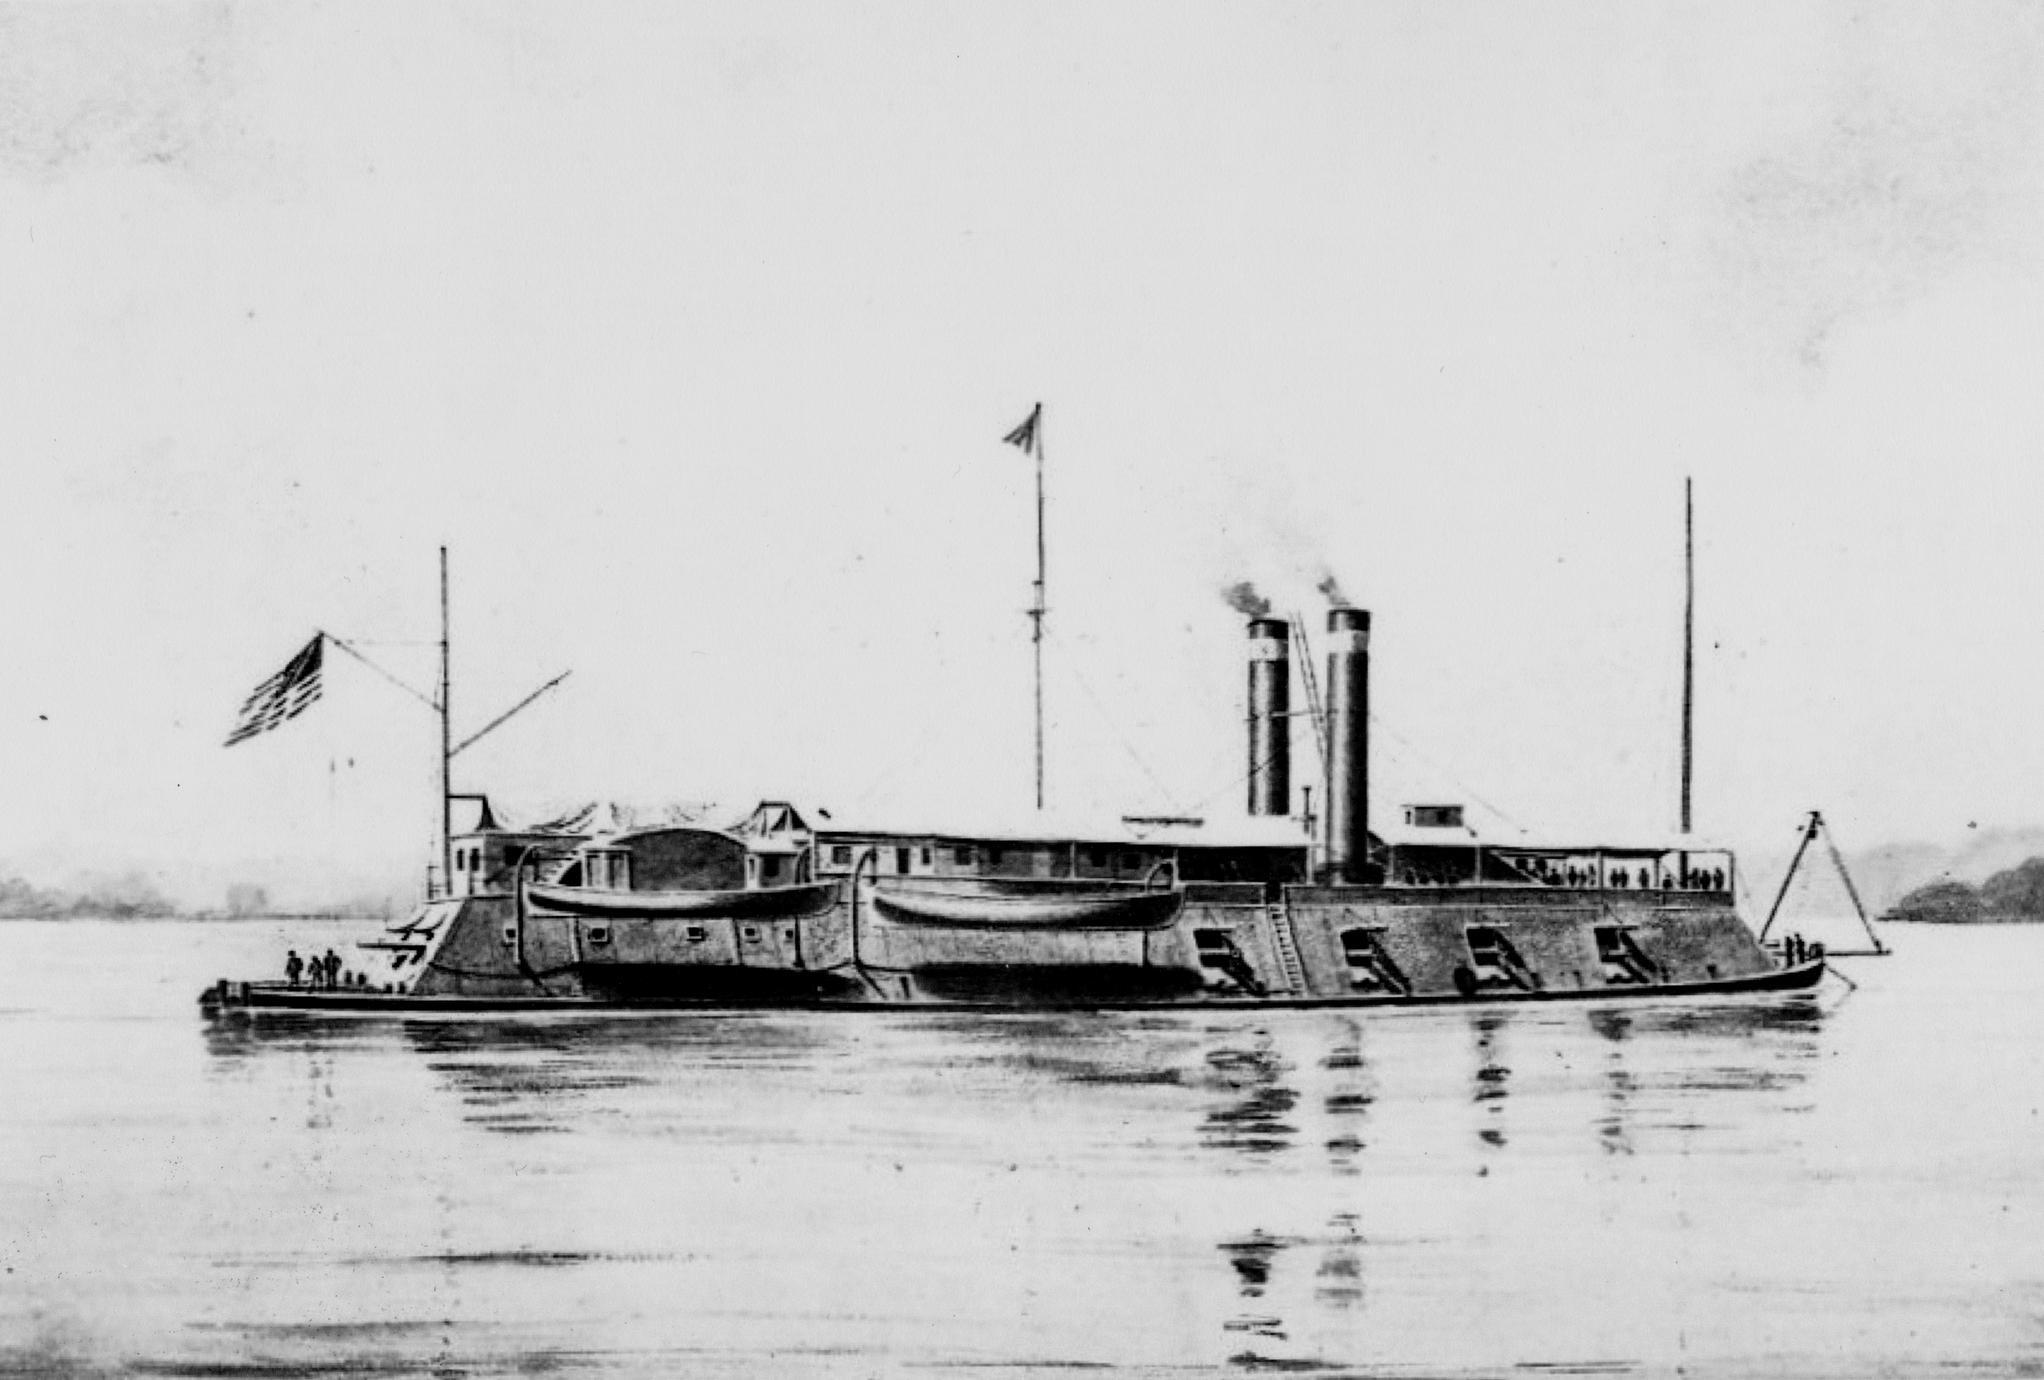 Louisville (Gunboat, 1861-1865)